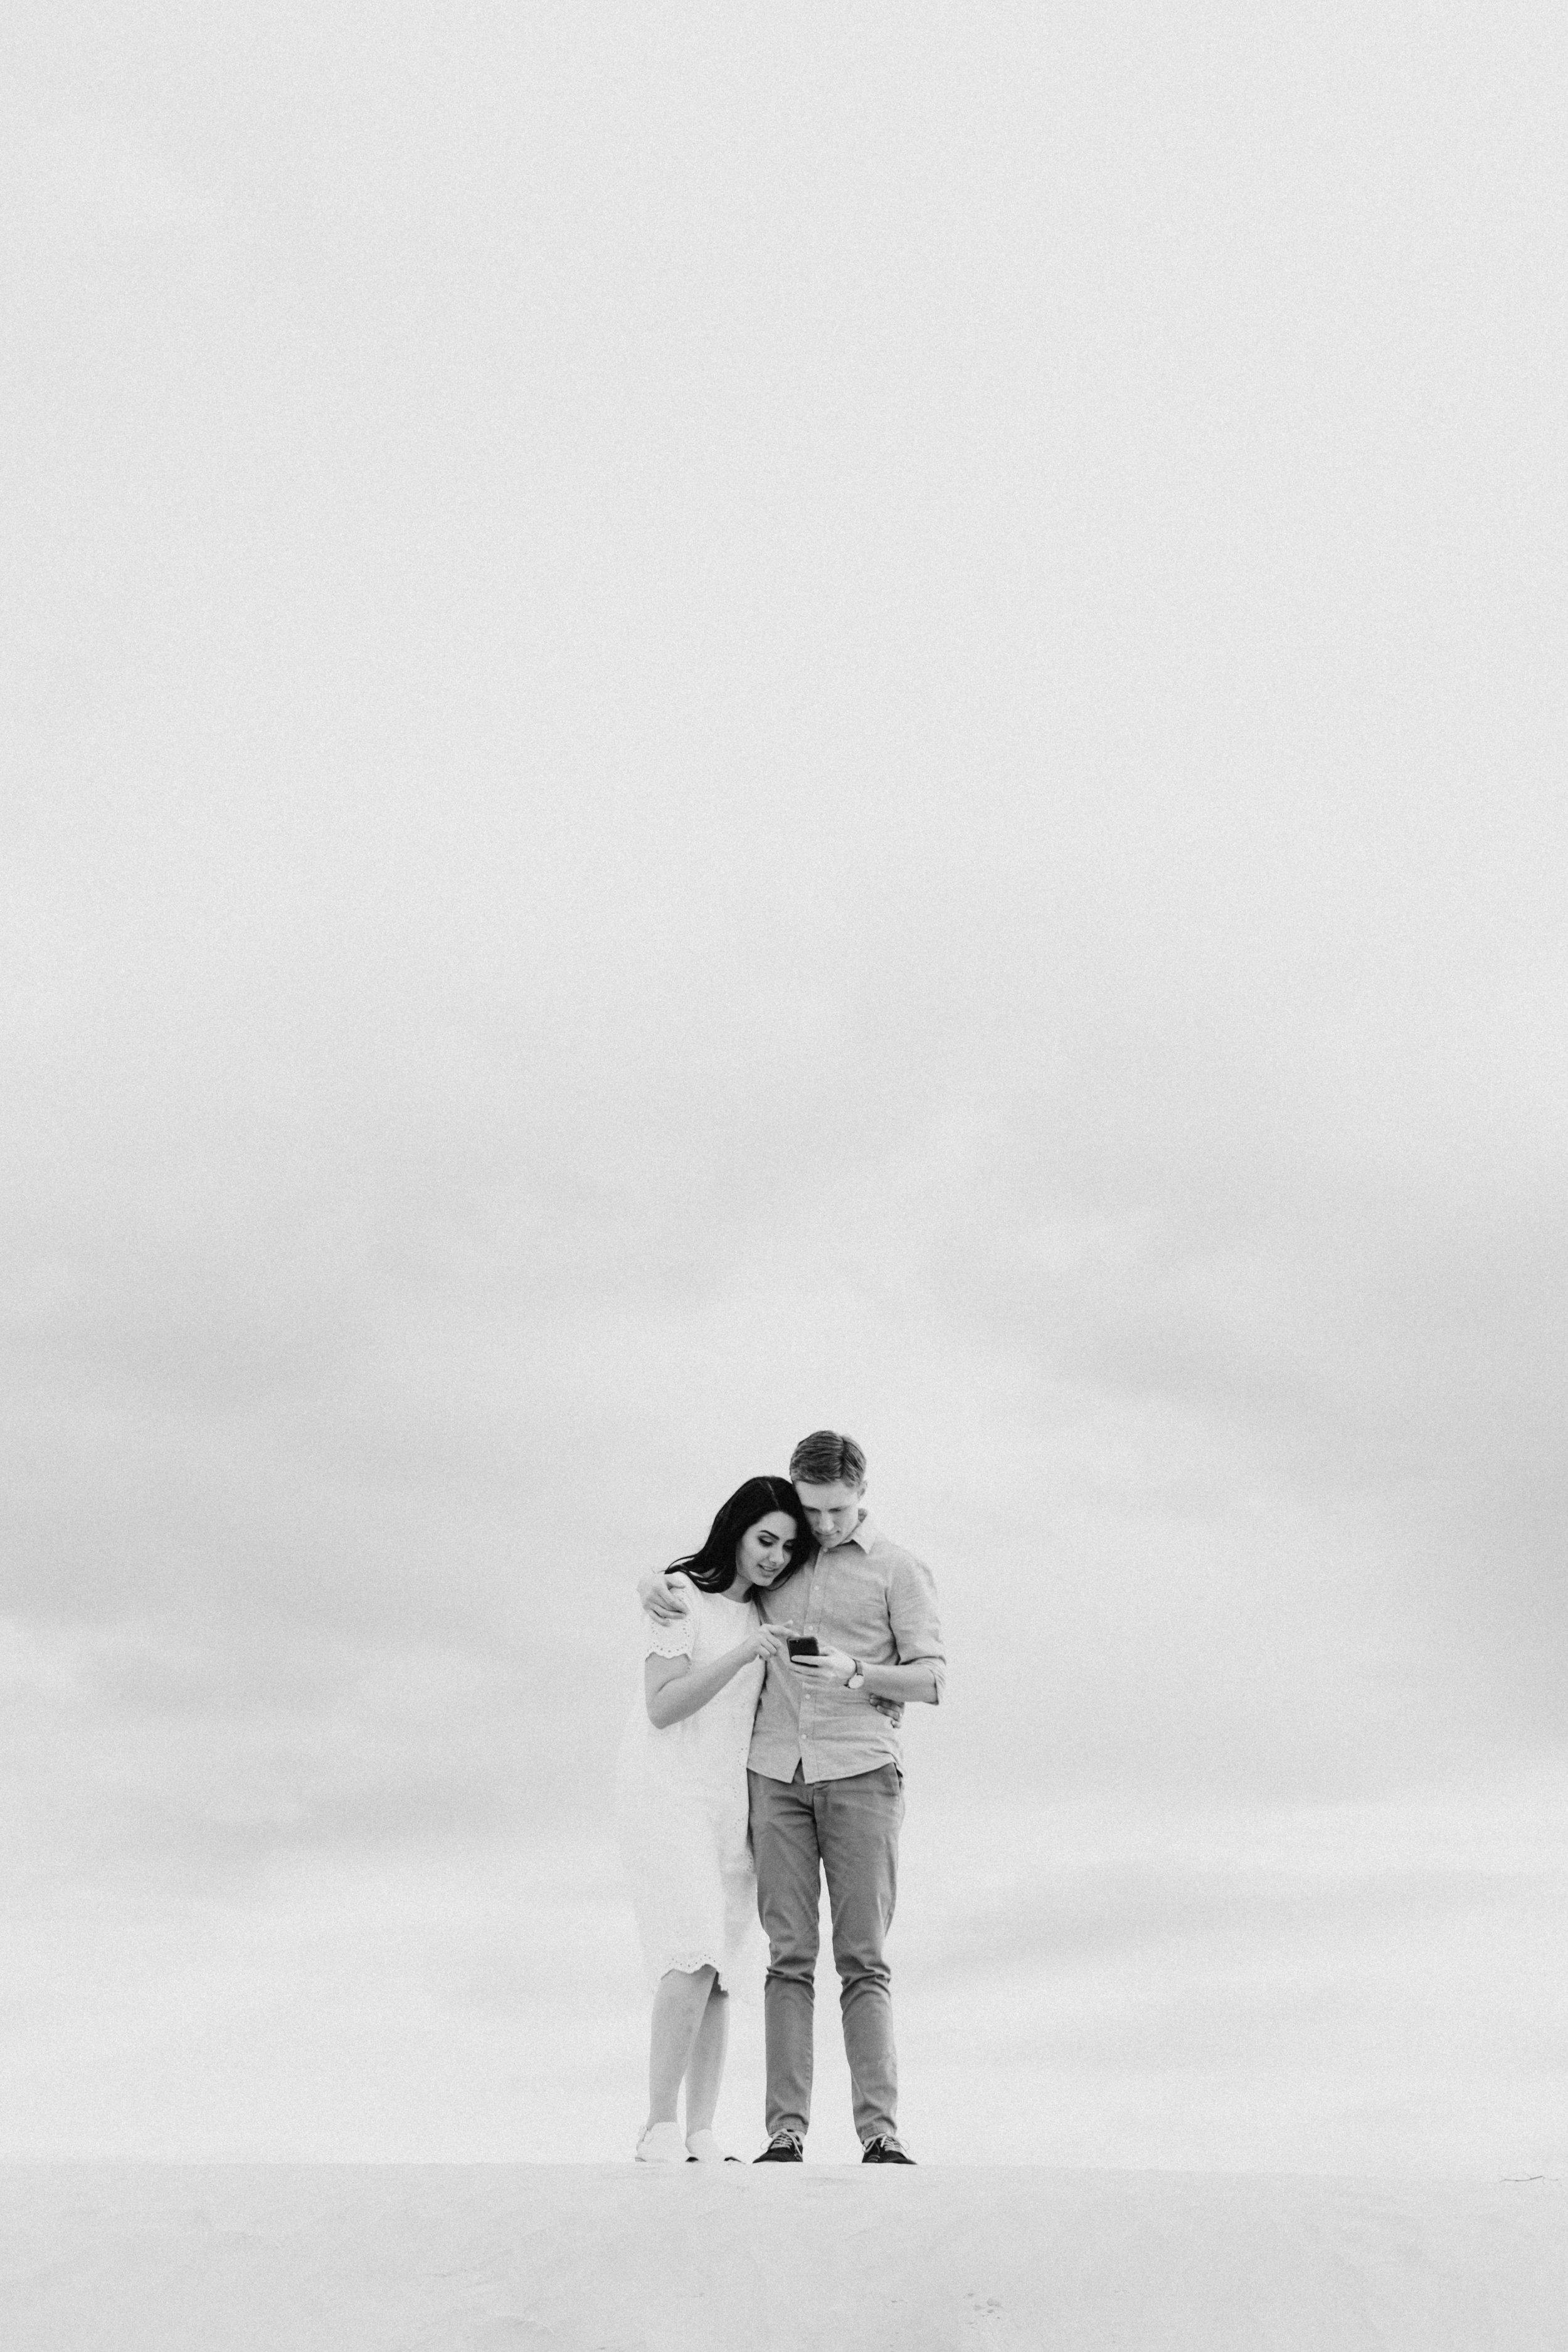 little-sahara-recreation-area-elopement-engagement-wedding-photography-michael-cozzens-35.jpg